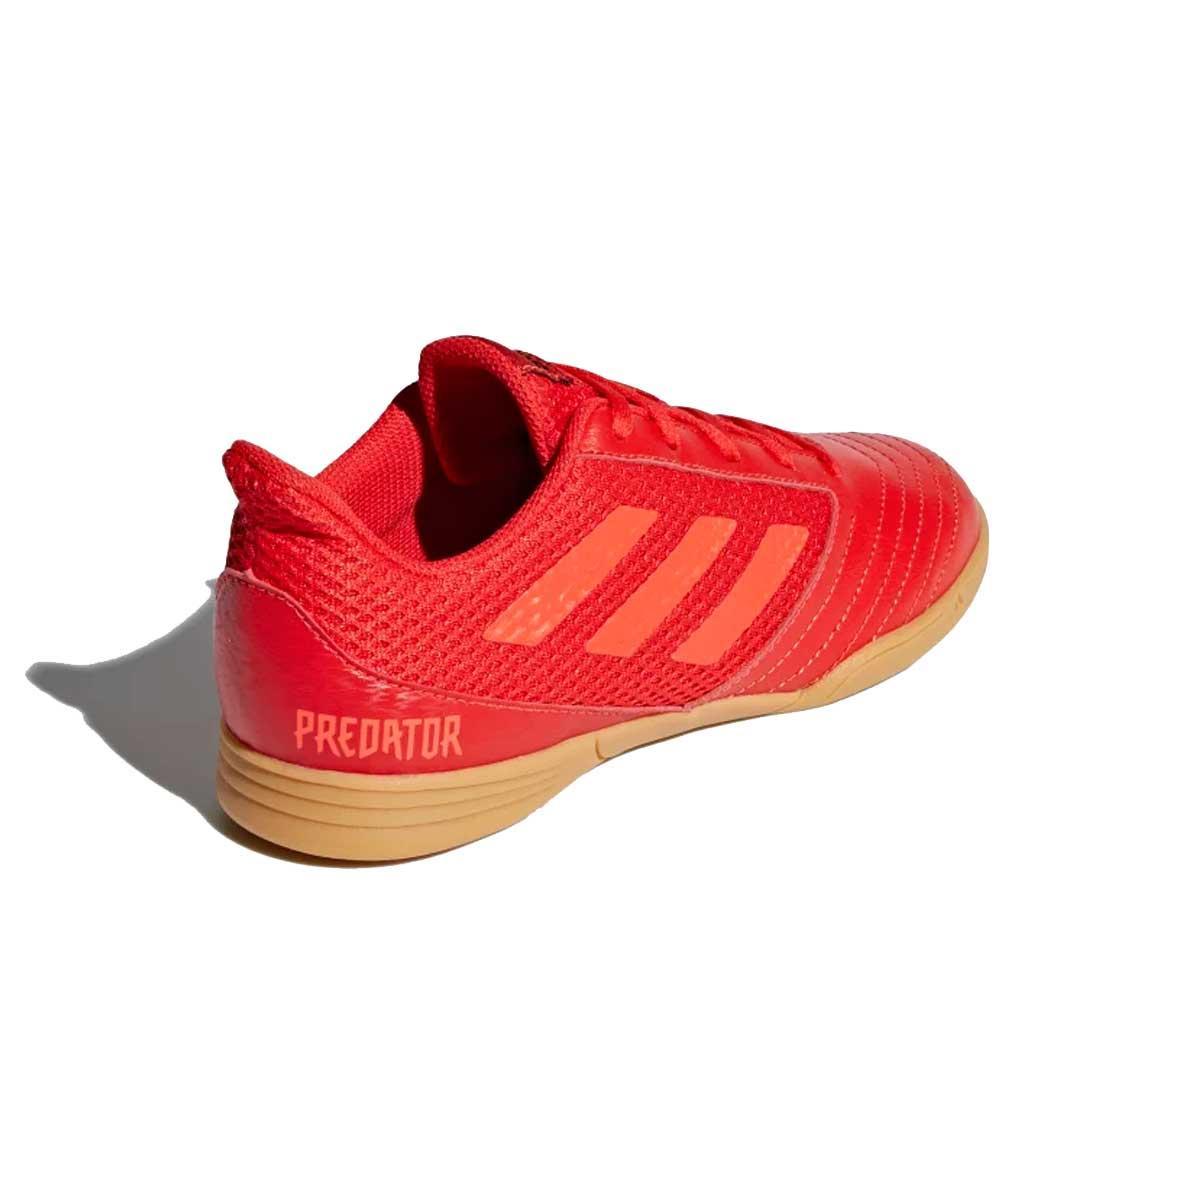 Chuteira Infantil Adidas Predator 19.4 Futsal 30693fecfb1e0